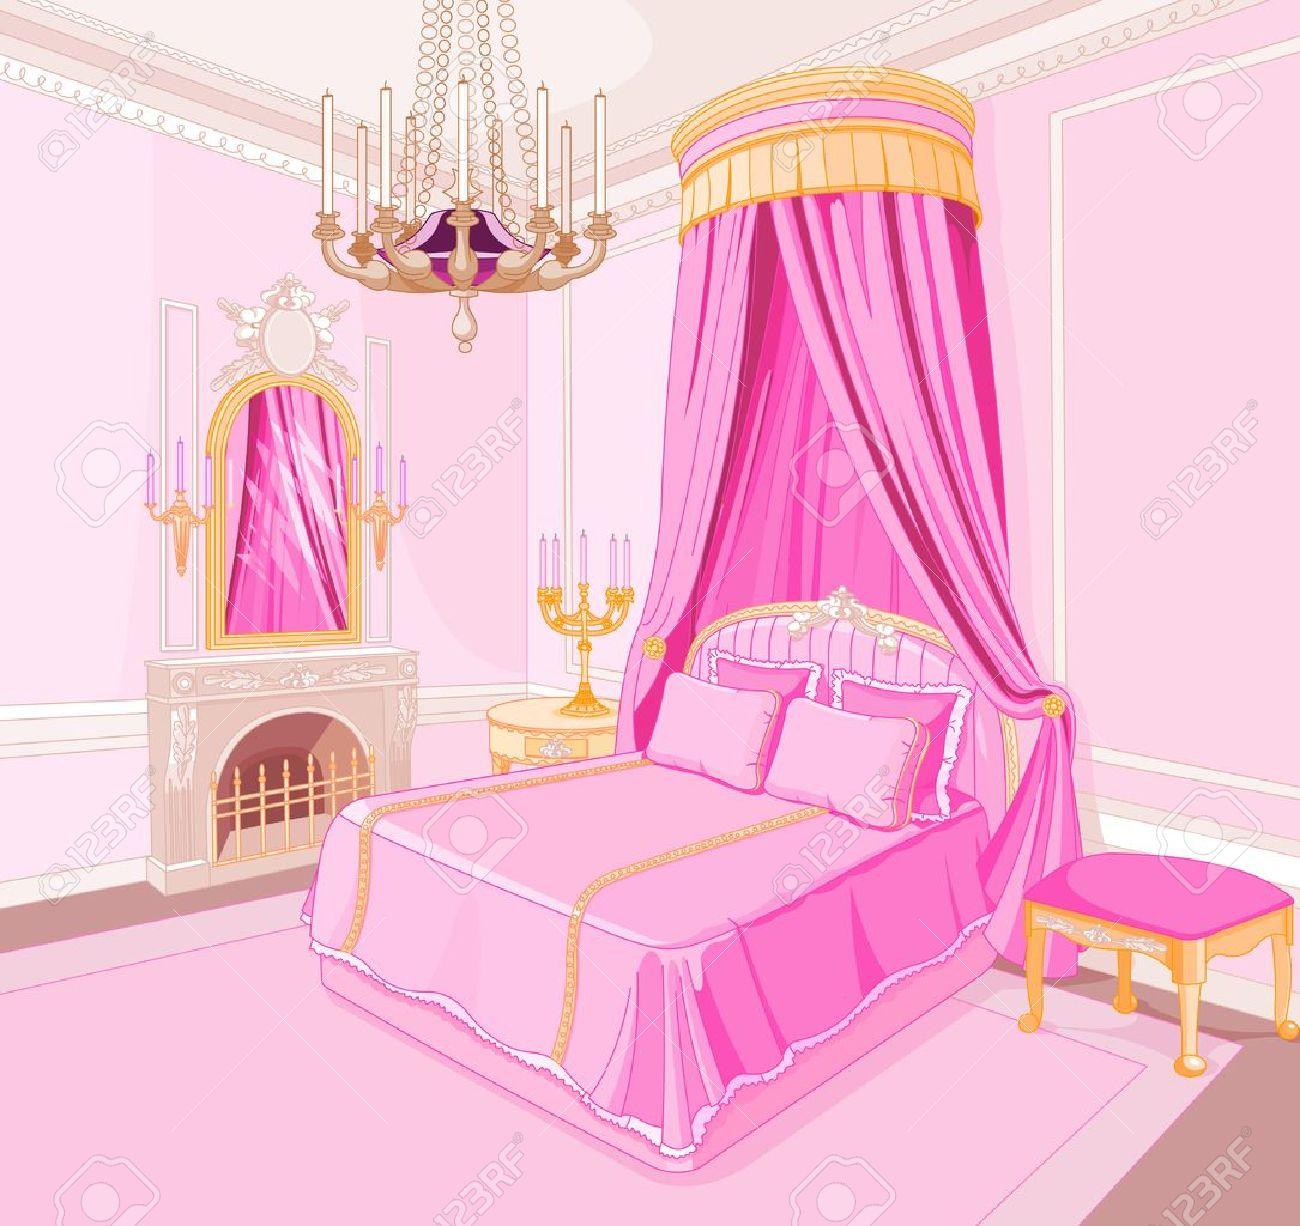 interior of magic princess bedroom royalty free cliparts, vectors